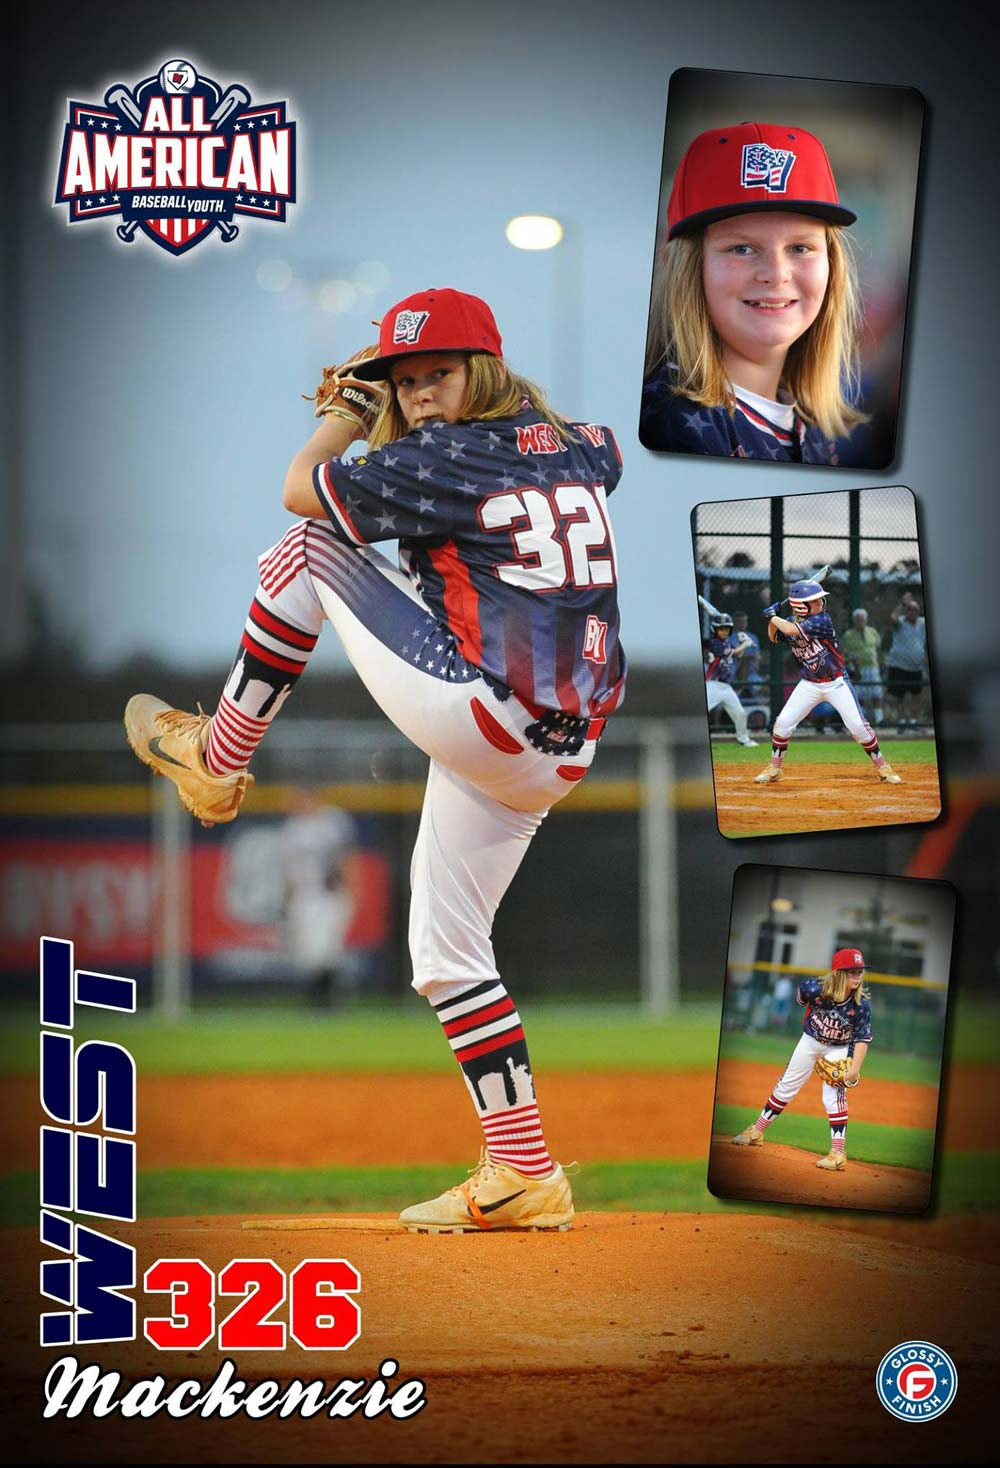 Baseball Youth All-American Games 2018